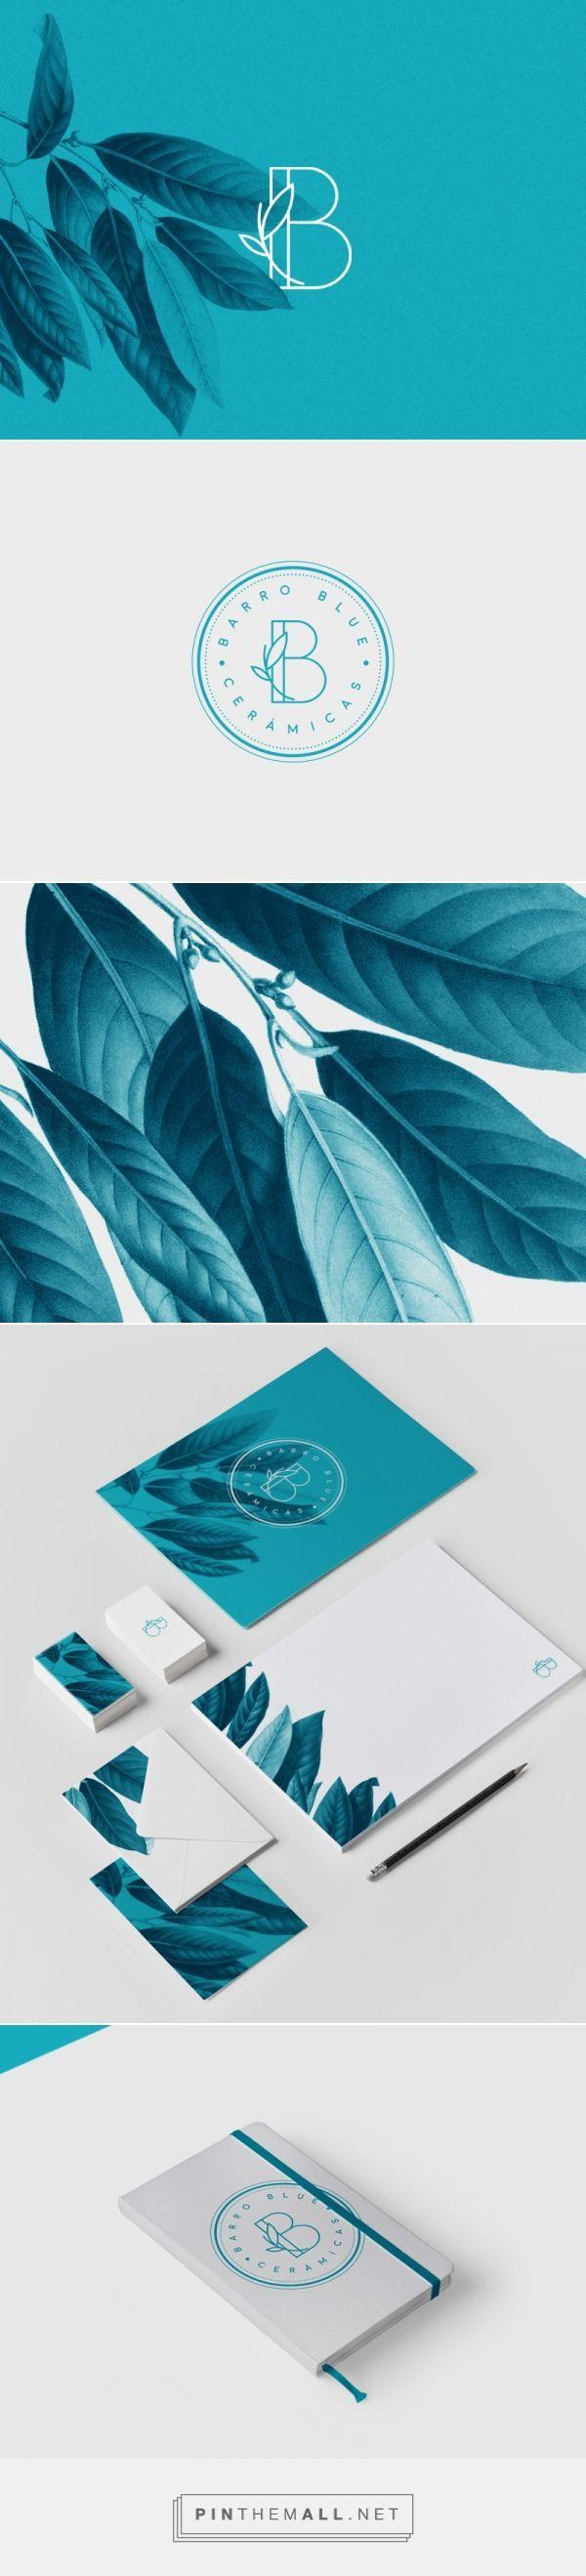 baroo blue logo